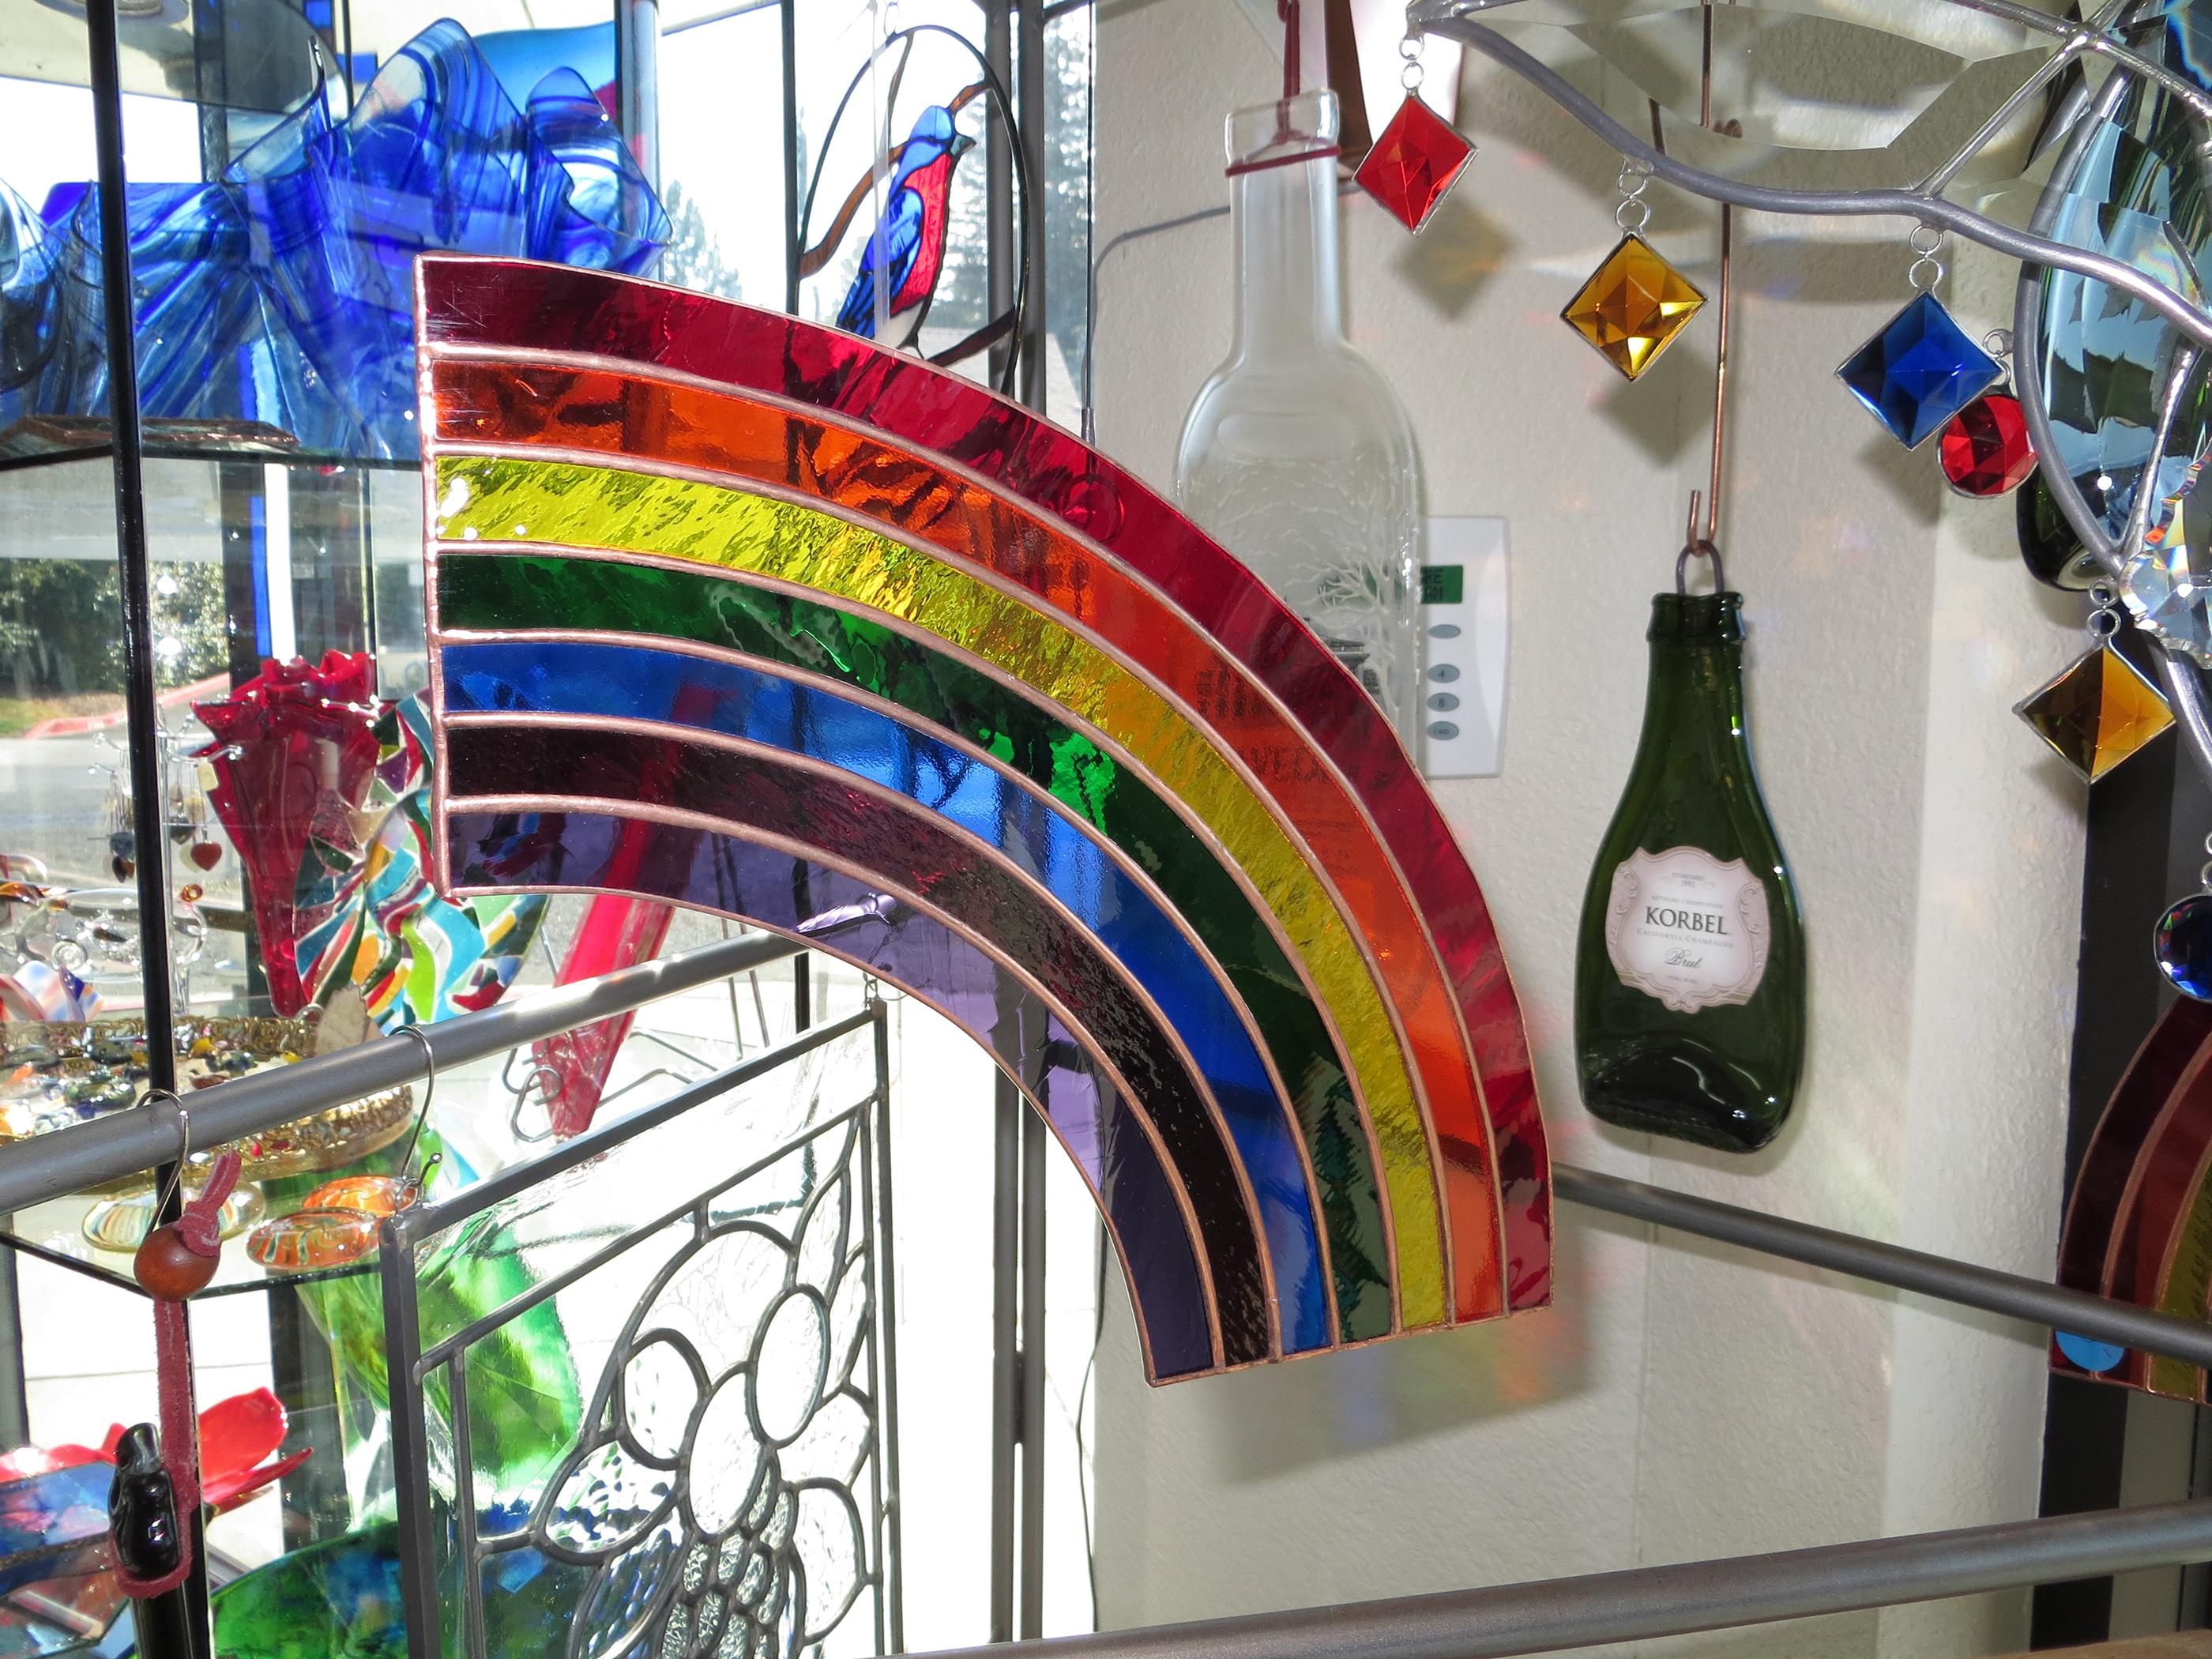 suncatcher-large-rainbow